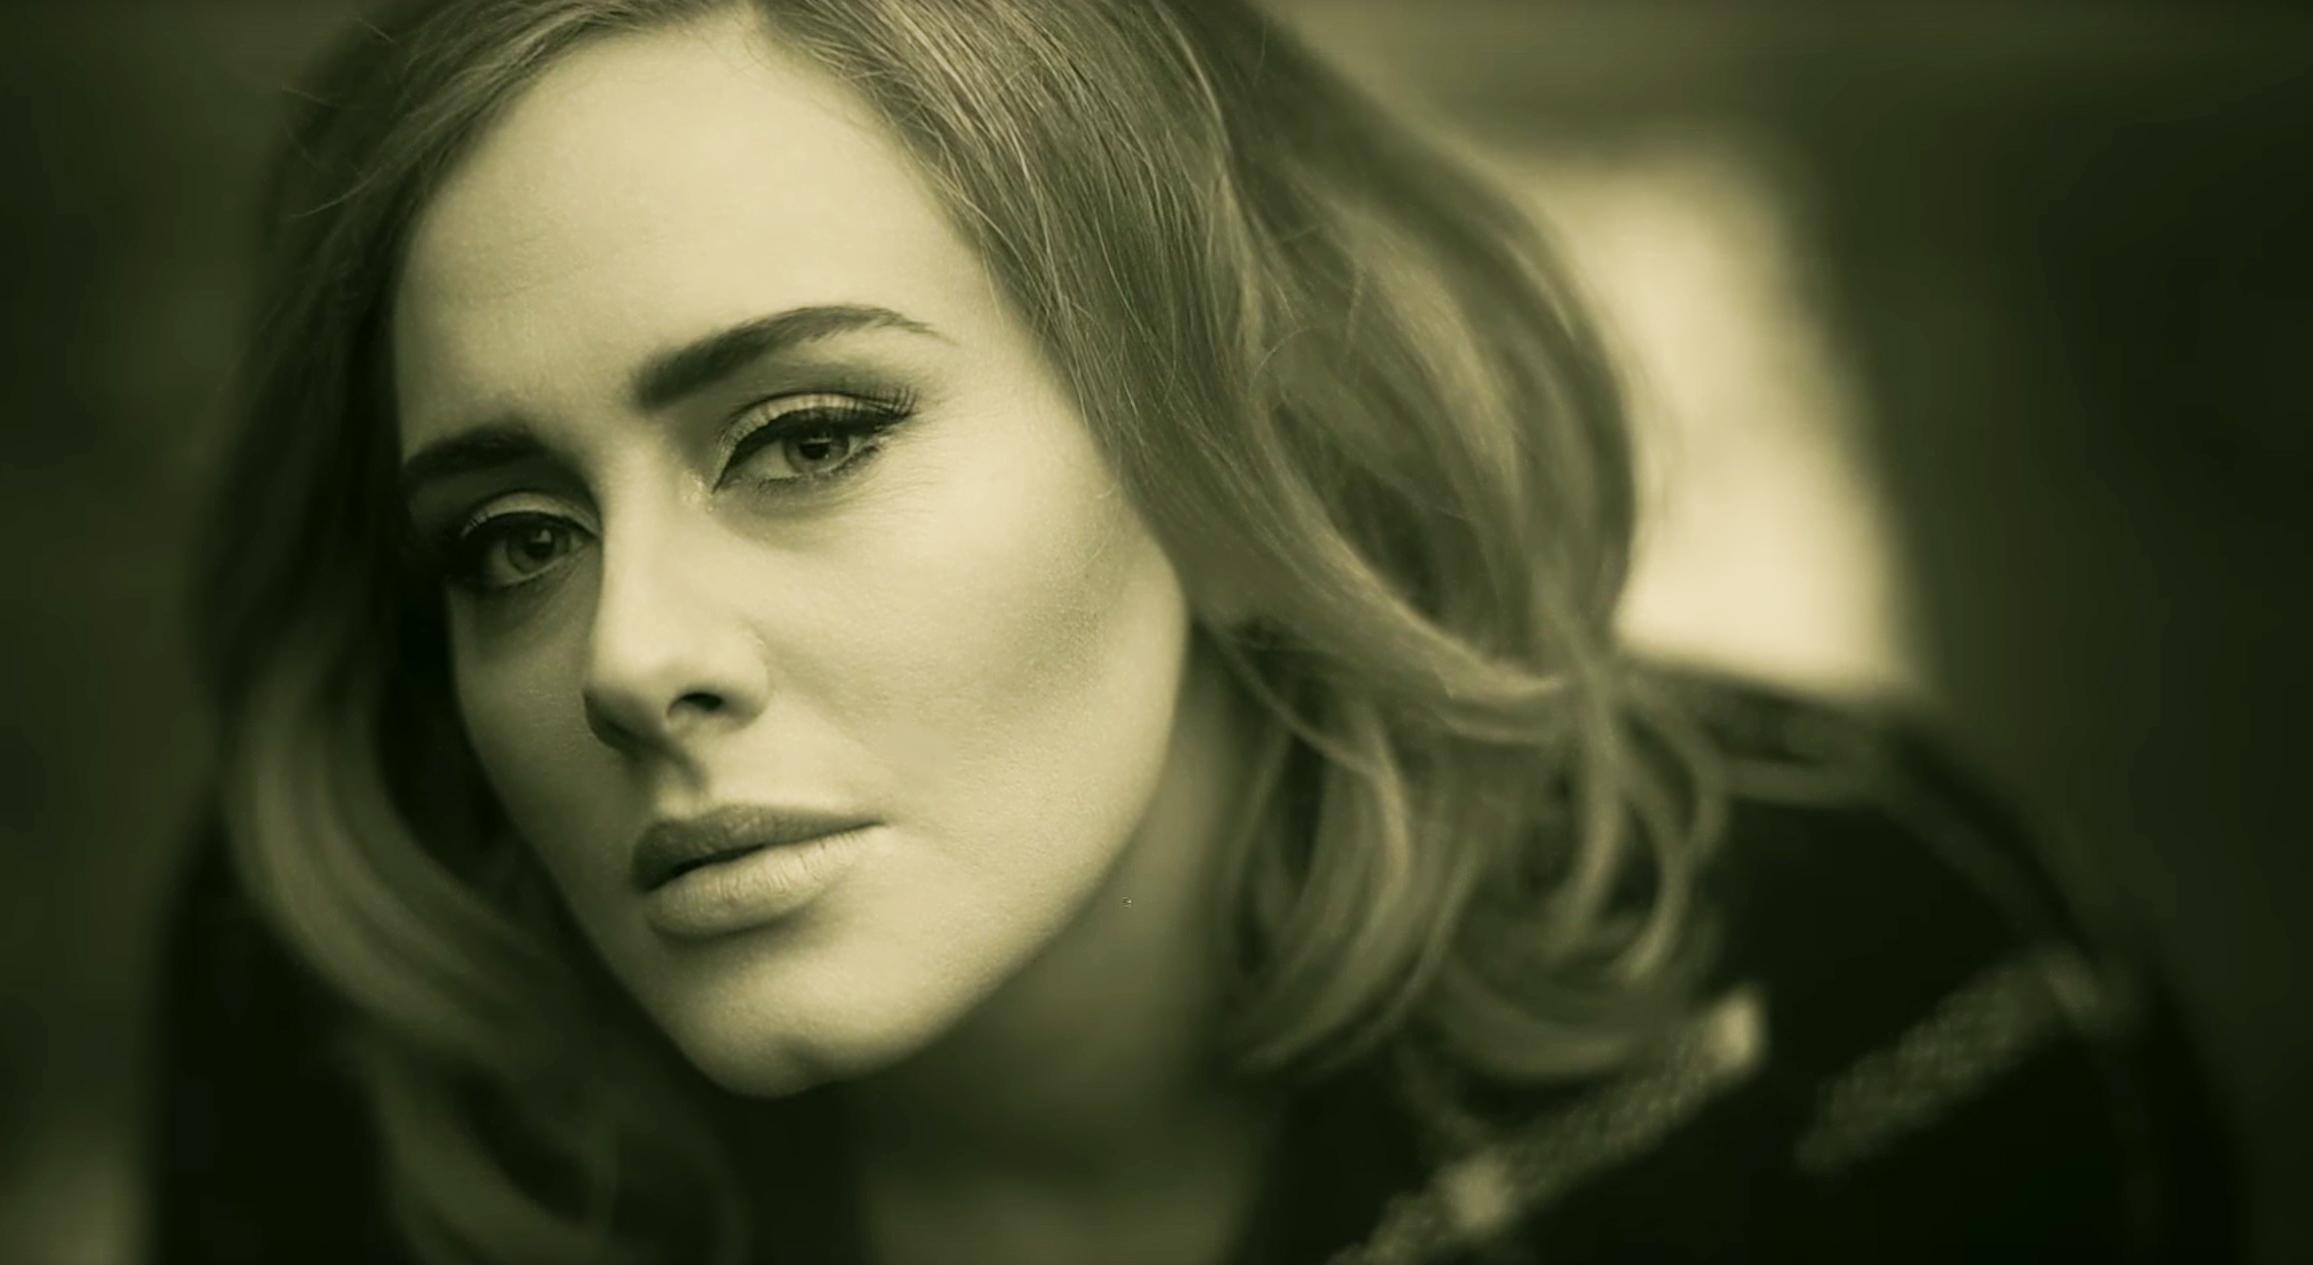 Adele's 'Hello' Tops 1 Million Downloads in Opening Week